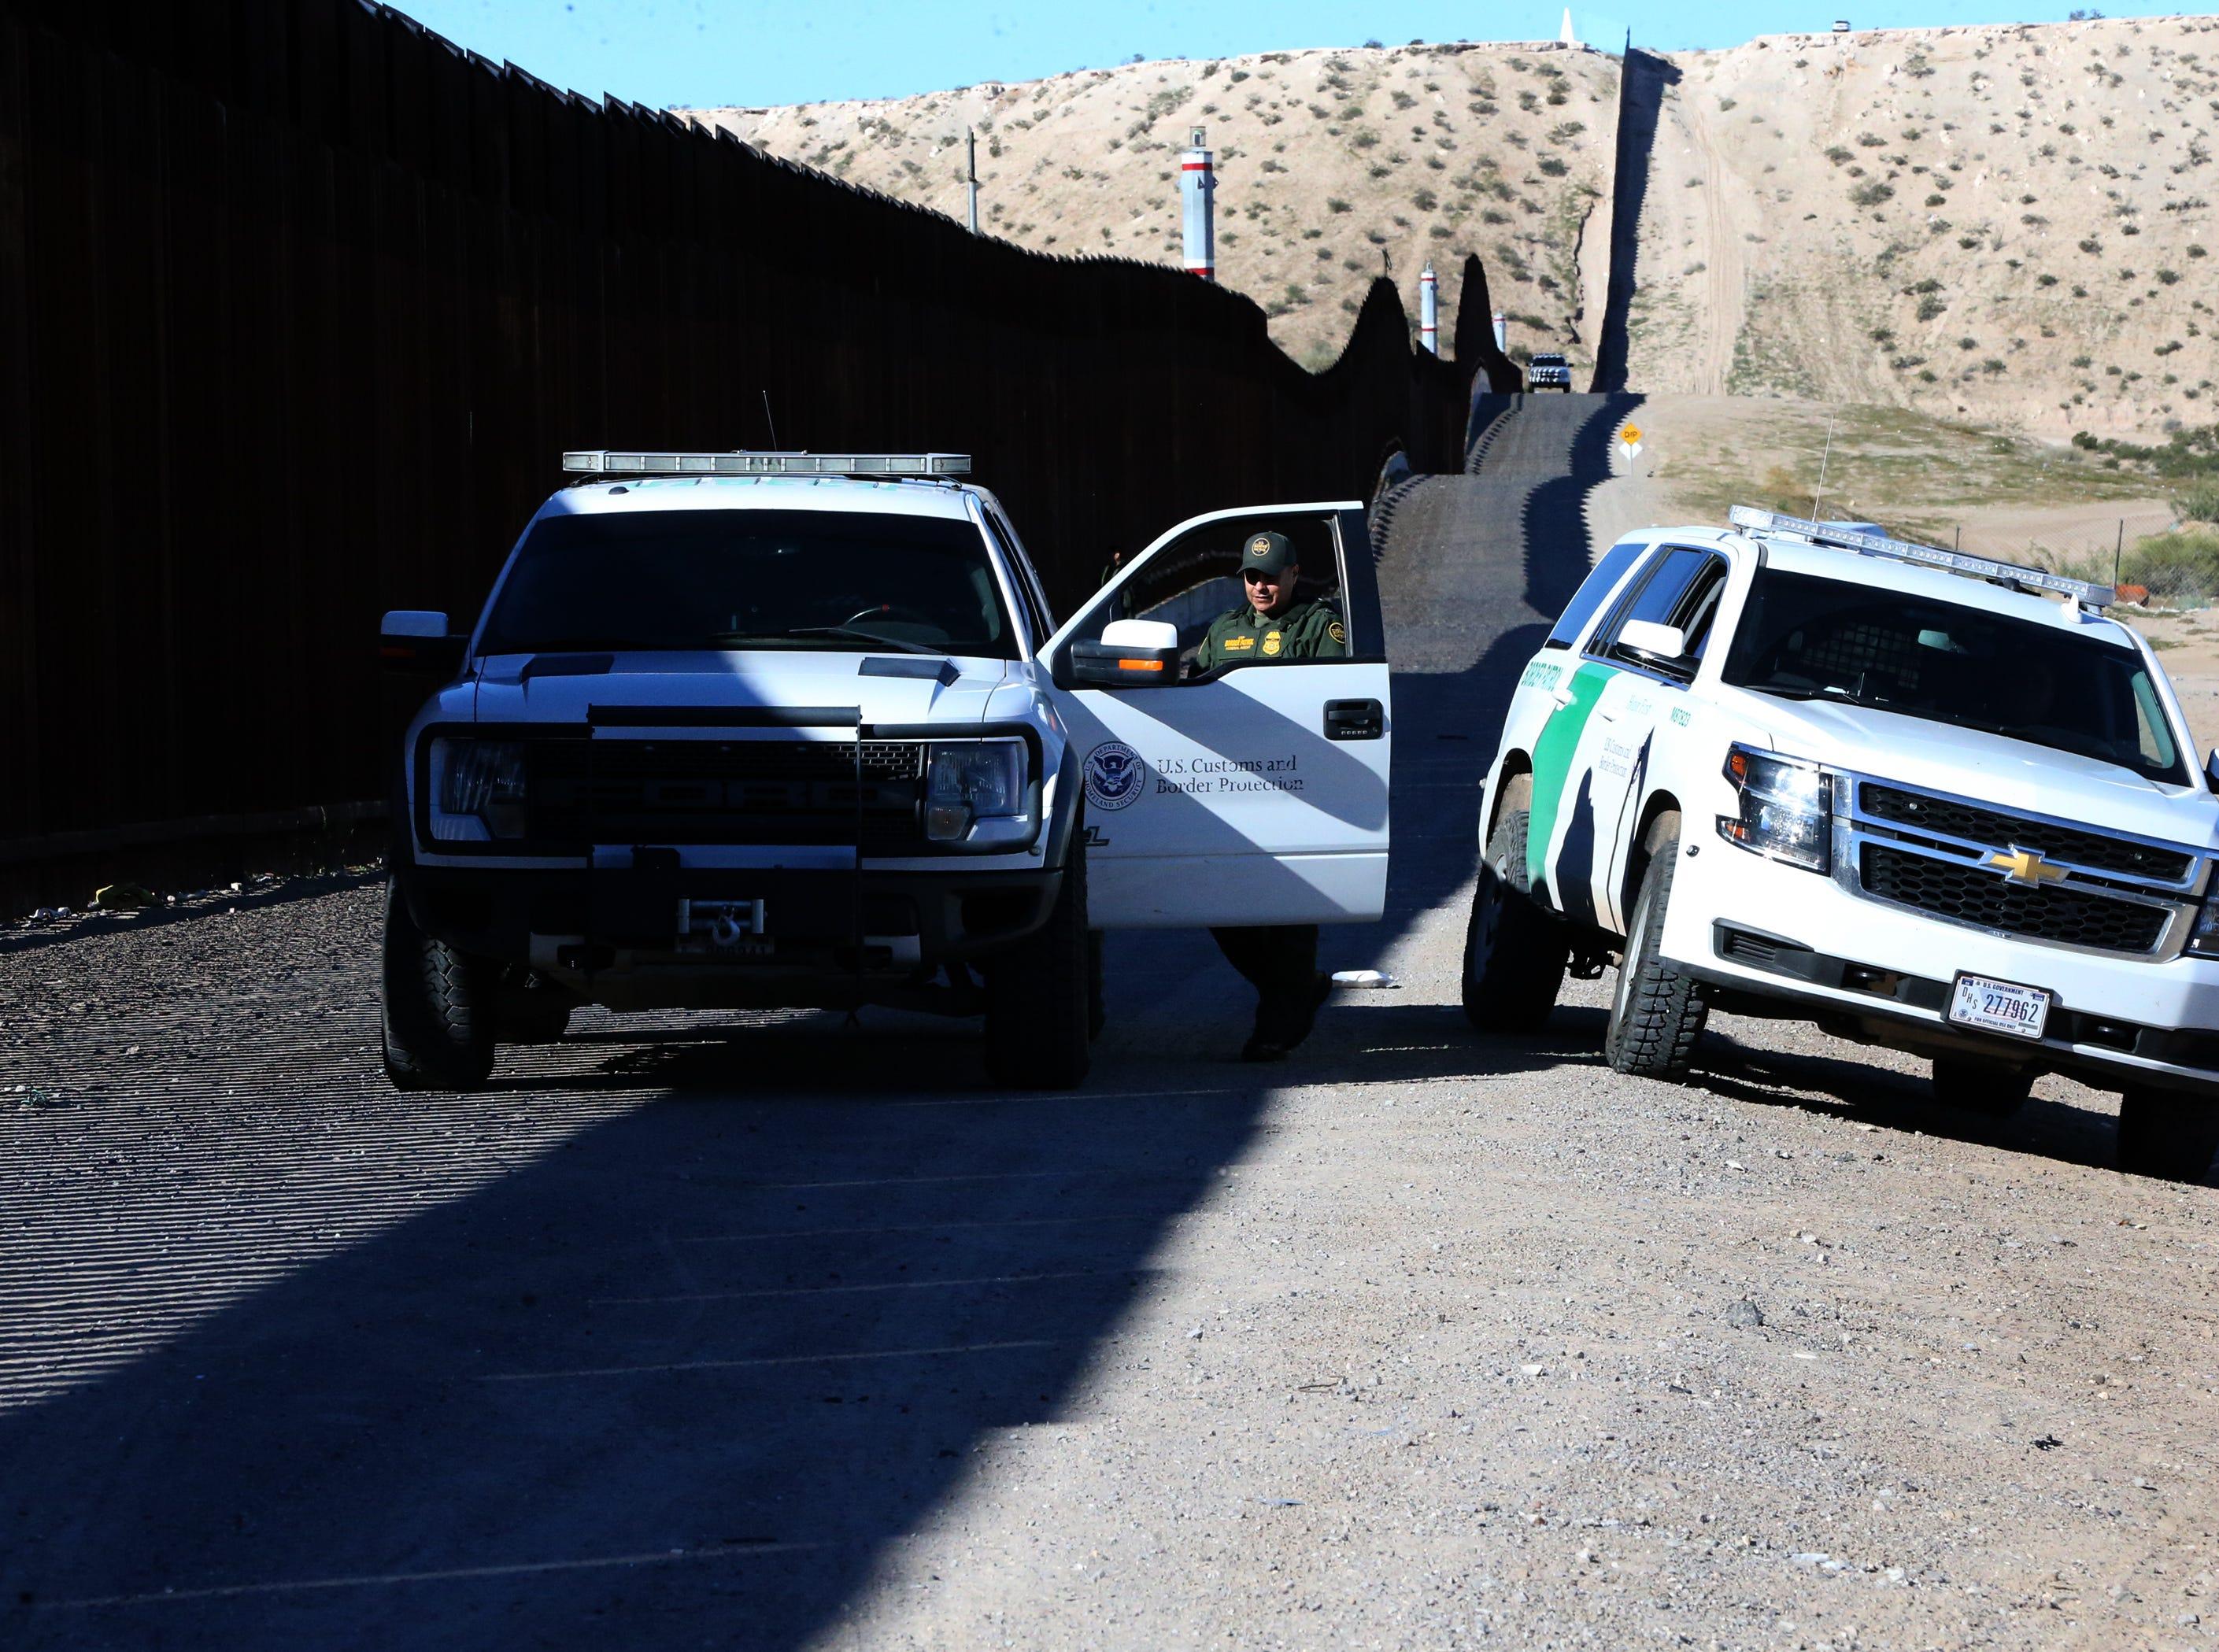 U.S. Border Patrol agents watch a gathering at the border fence Saturday.